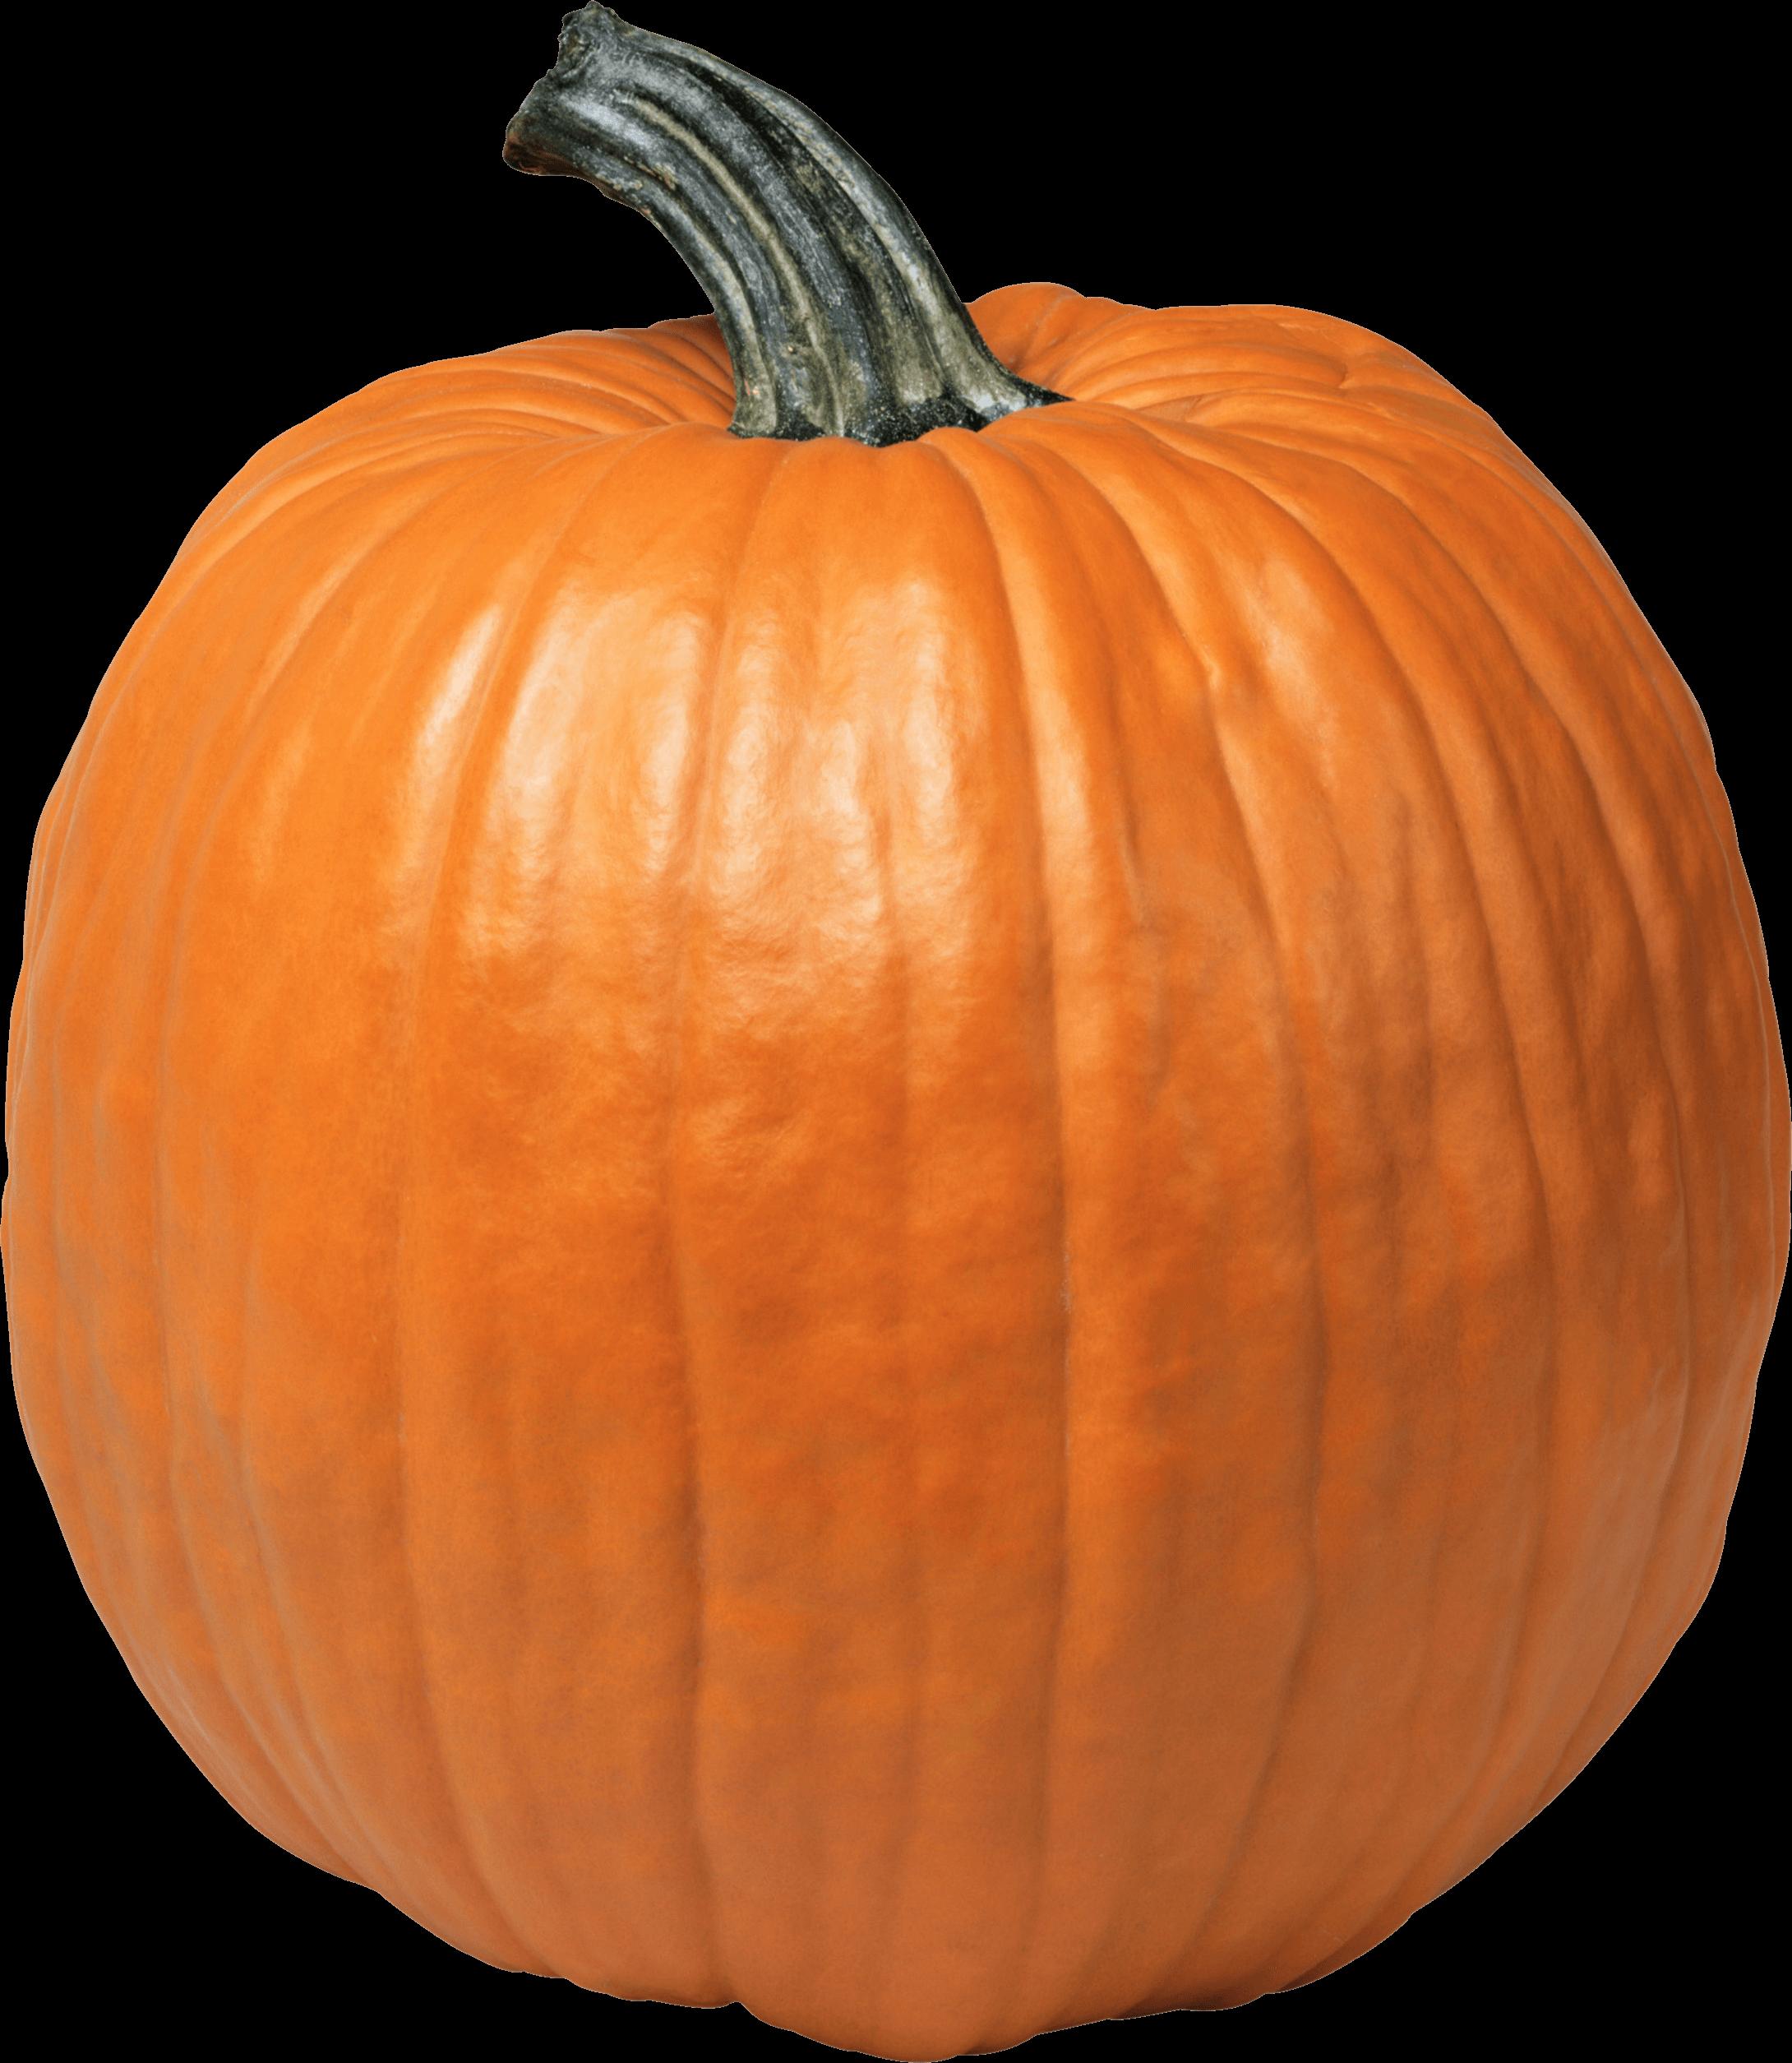 Clipart pumpkin stack. Single transparent png stickpng